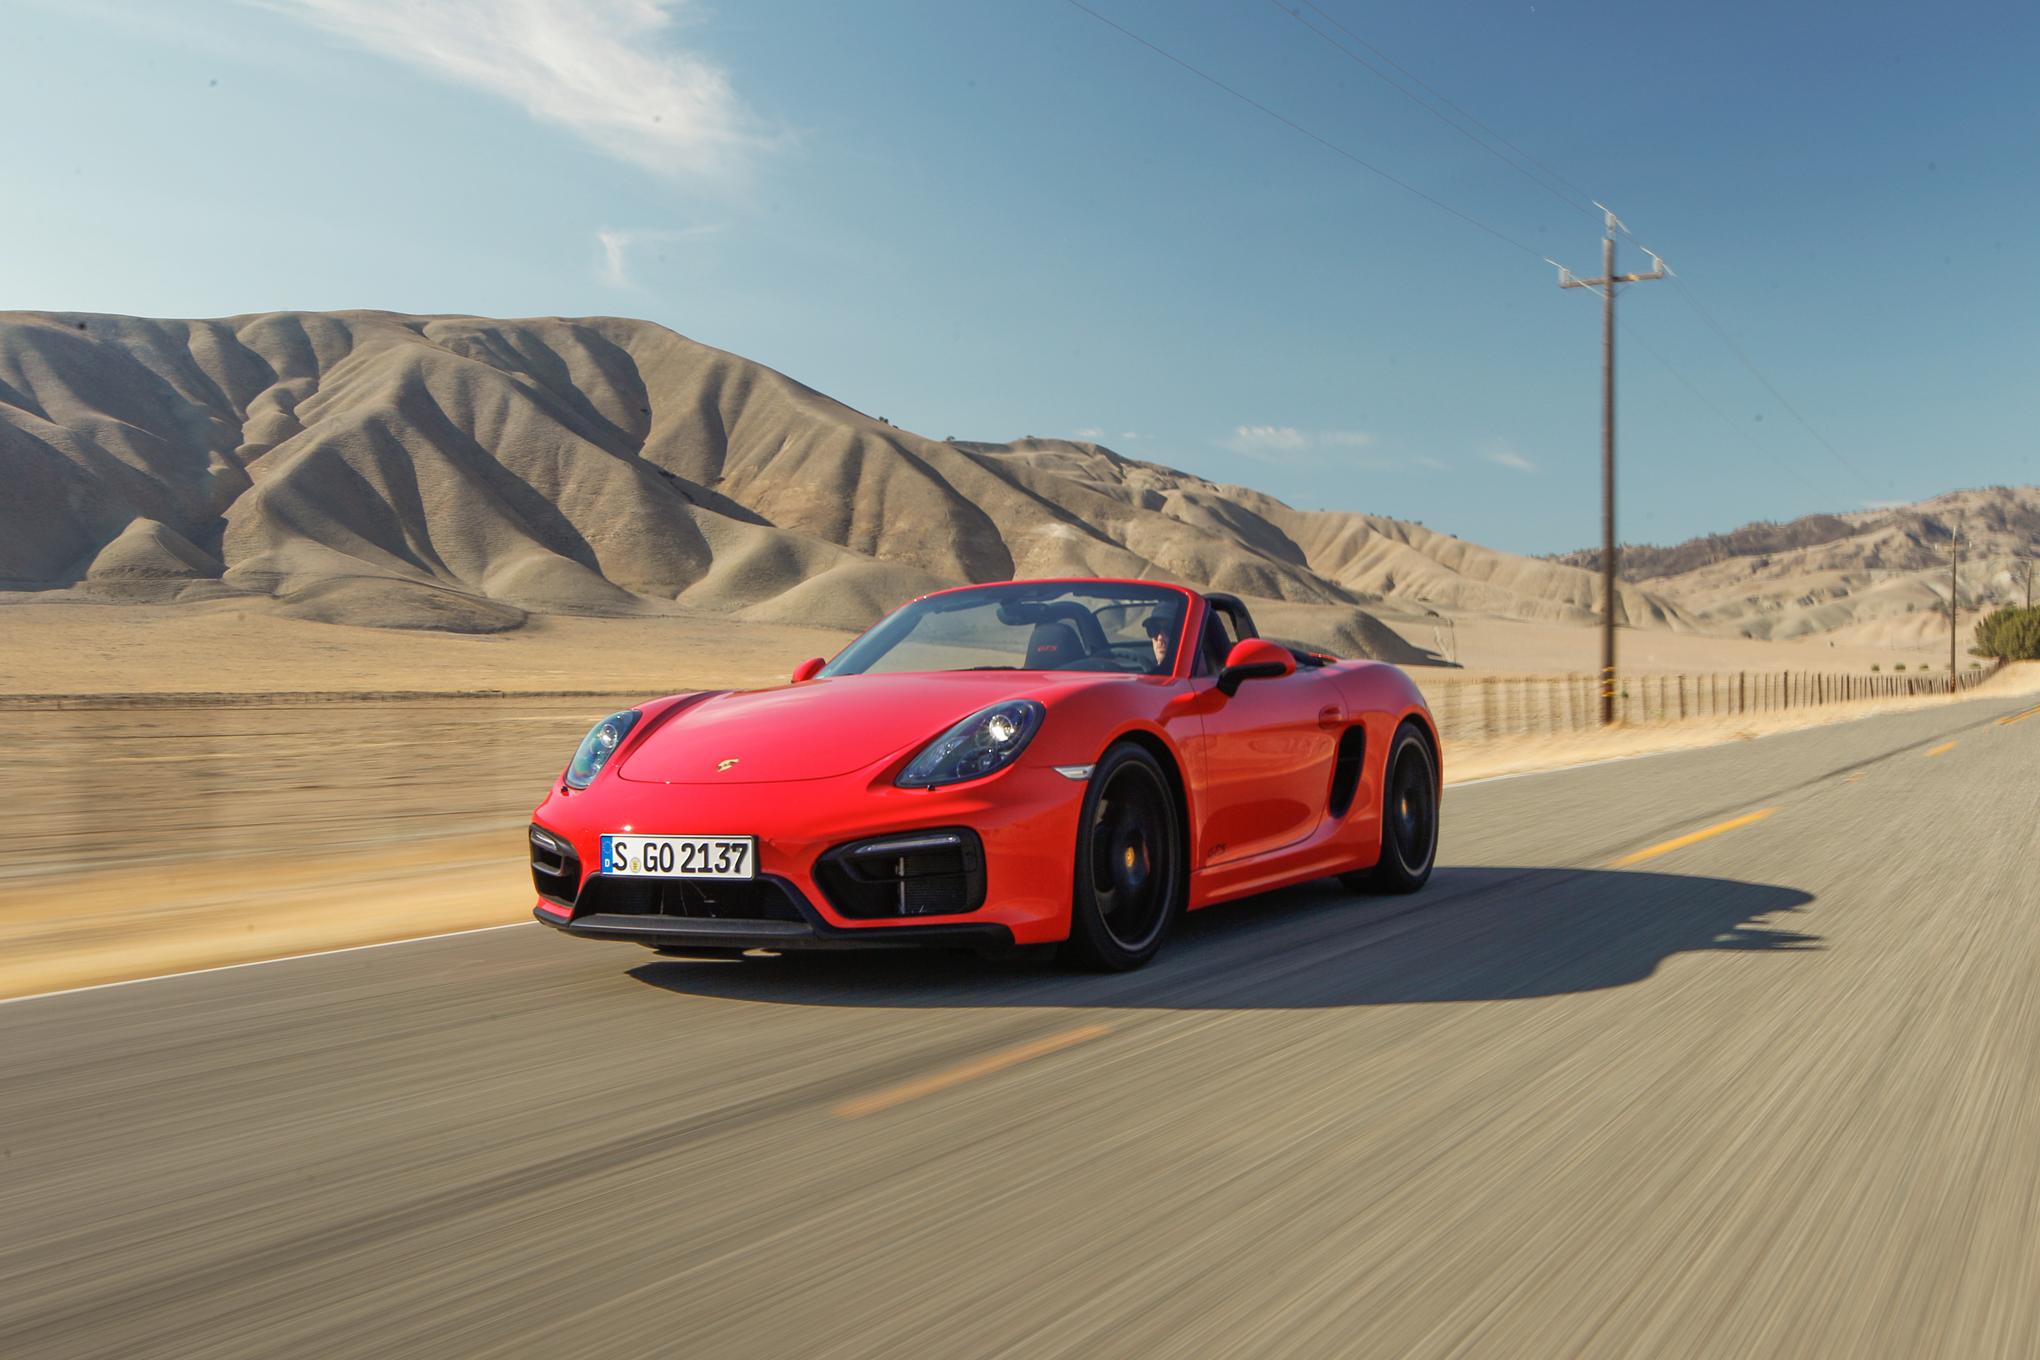 2015 Porsche Boxster Front Side Photo